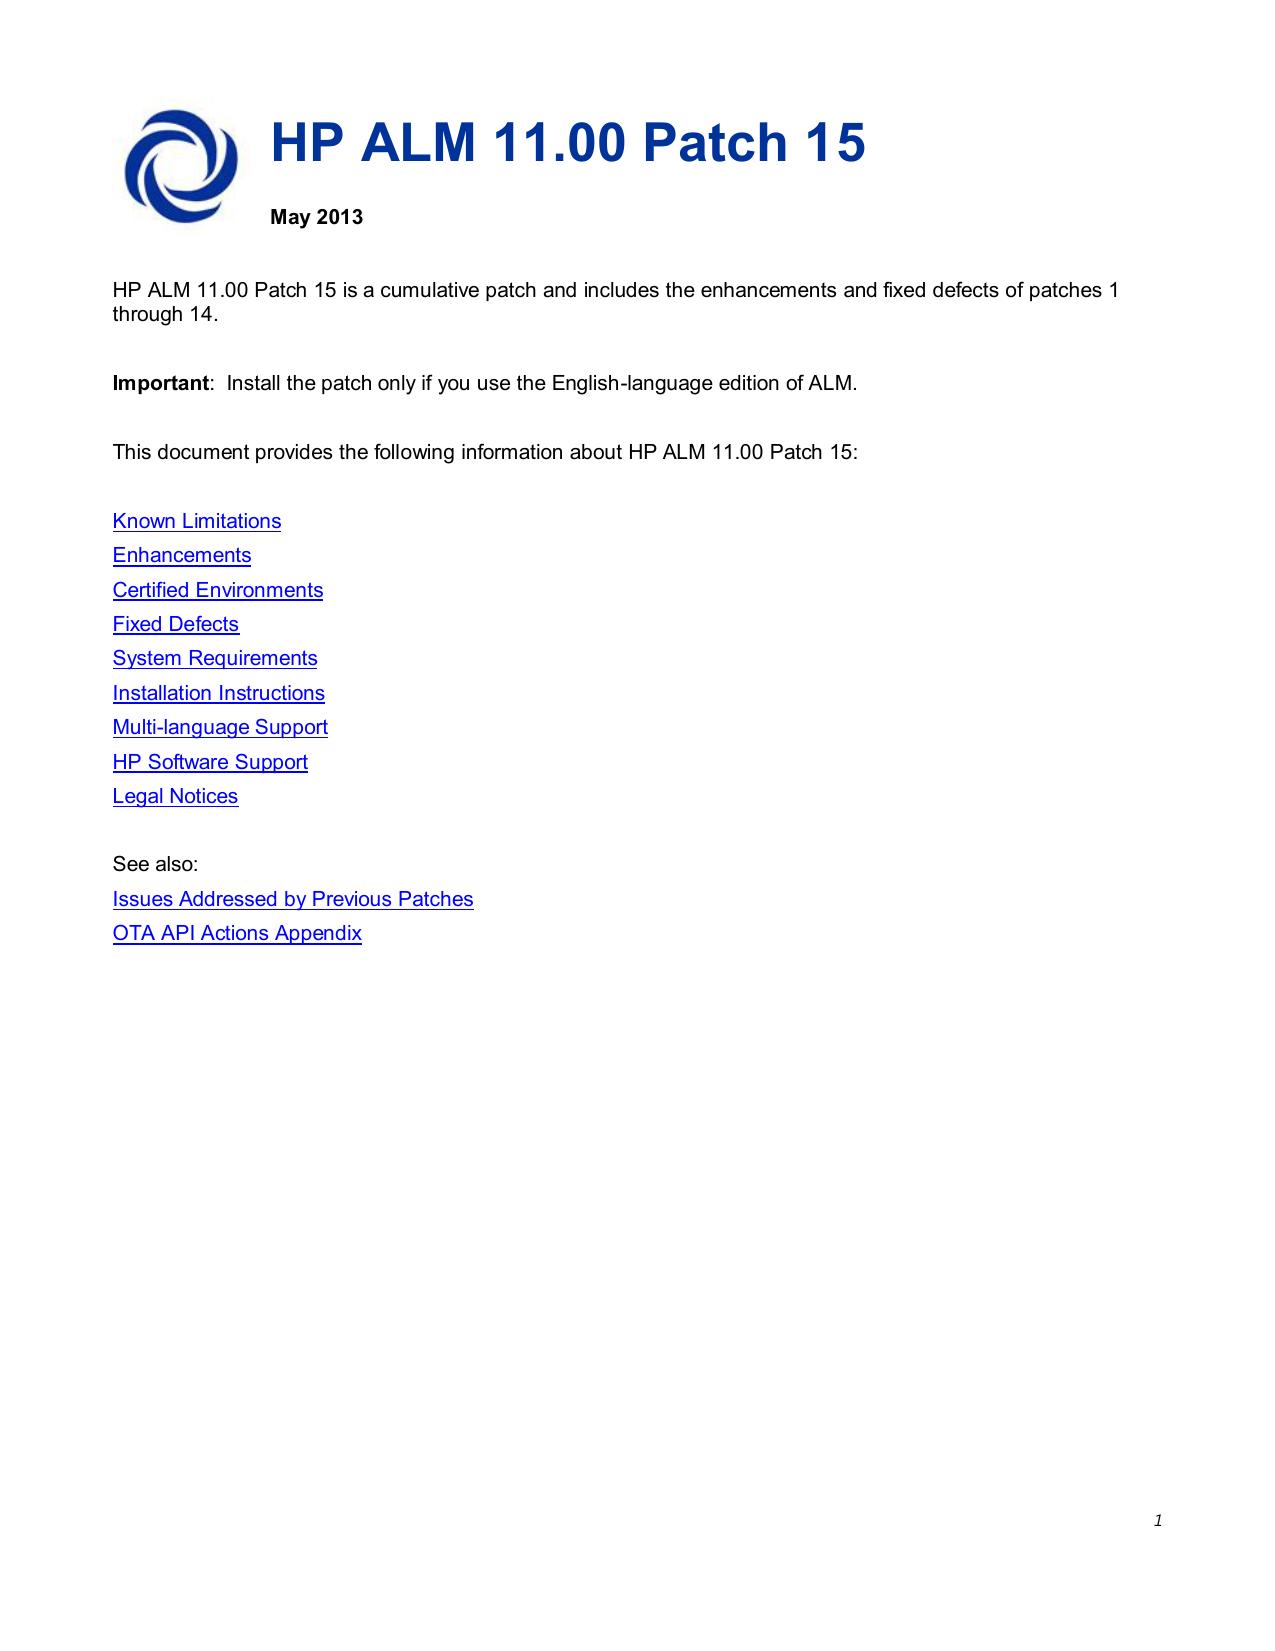 HP ALM 11 00 Patch 15 - SAP Service Marketplace | manualzz com